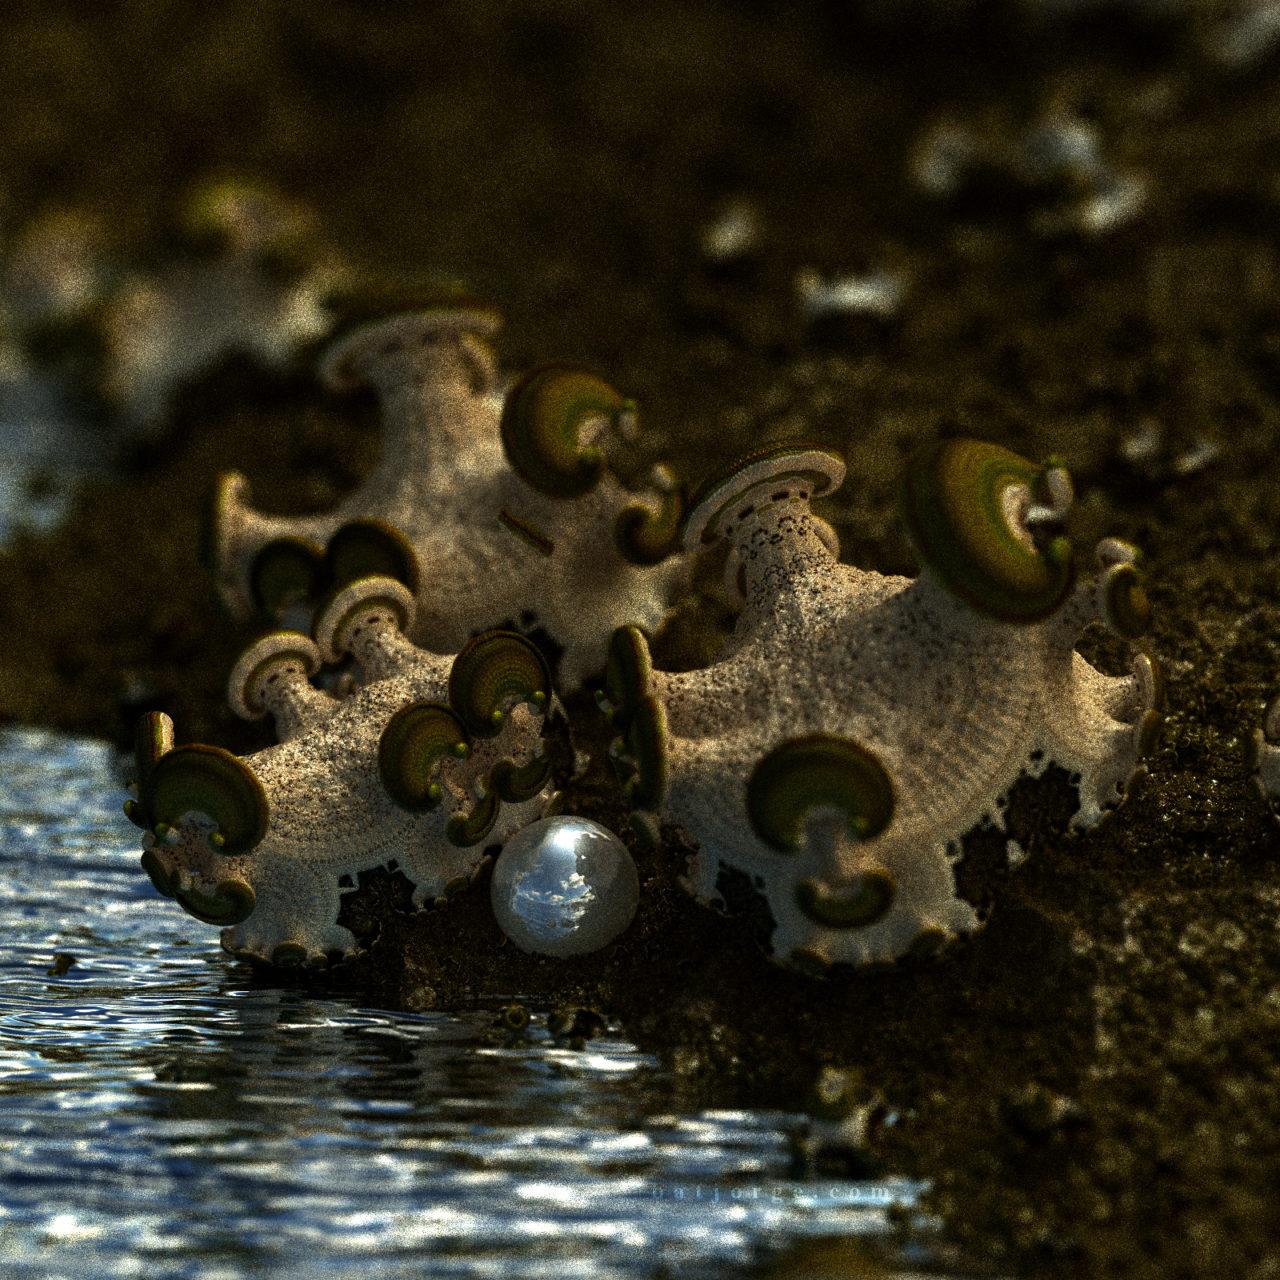 3D fractal mandelbulber amazingsurf water and sphere